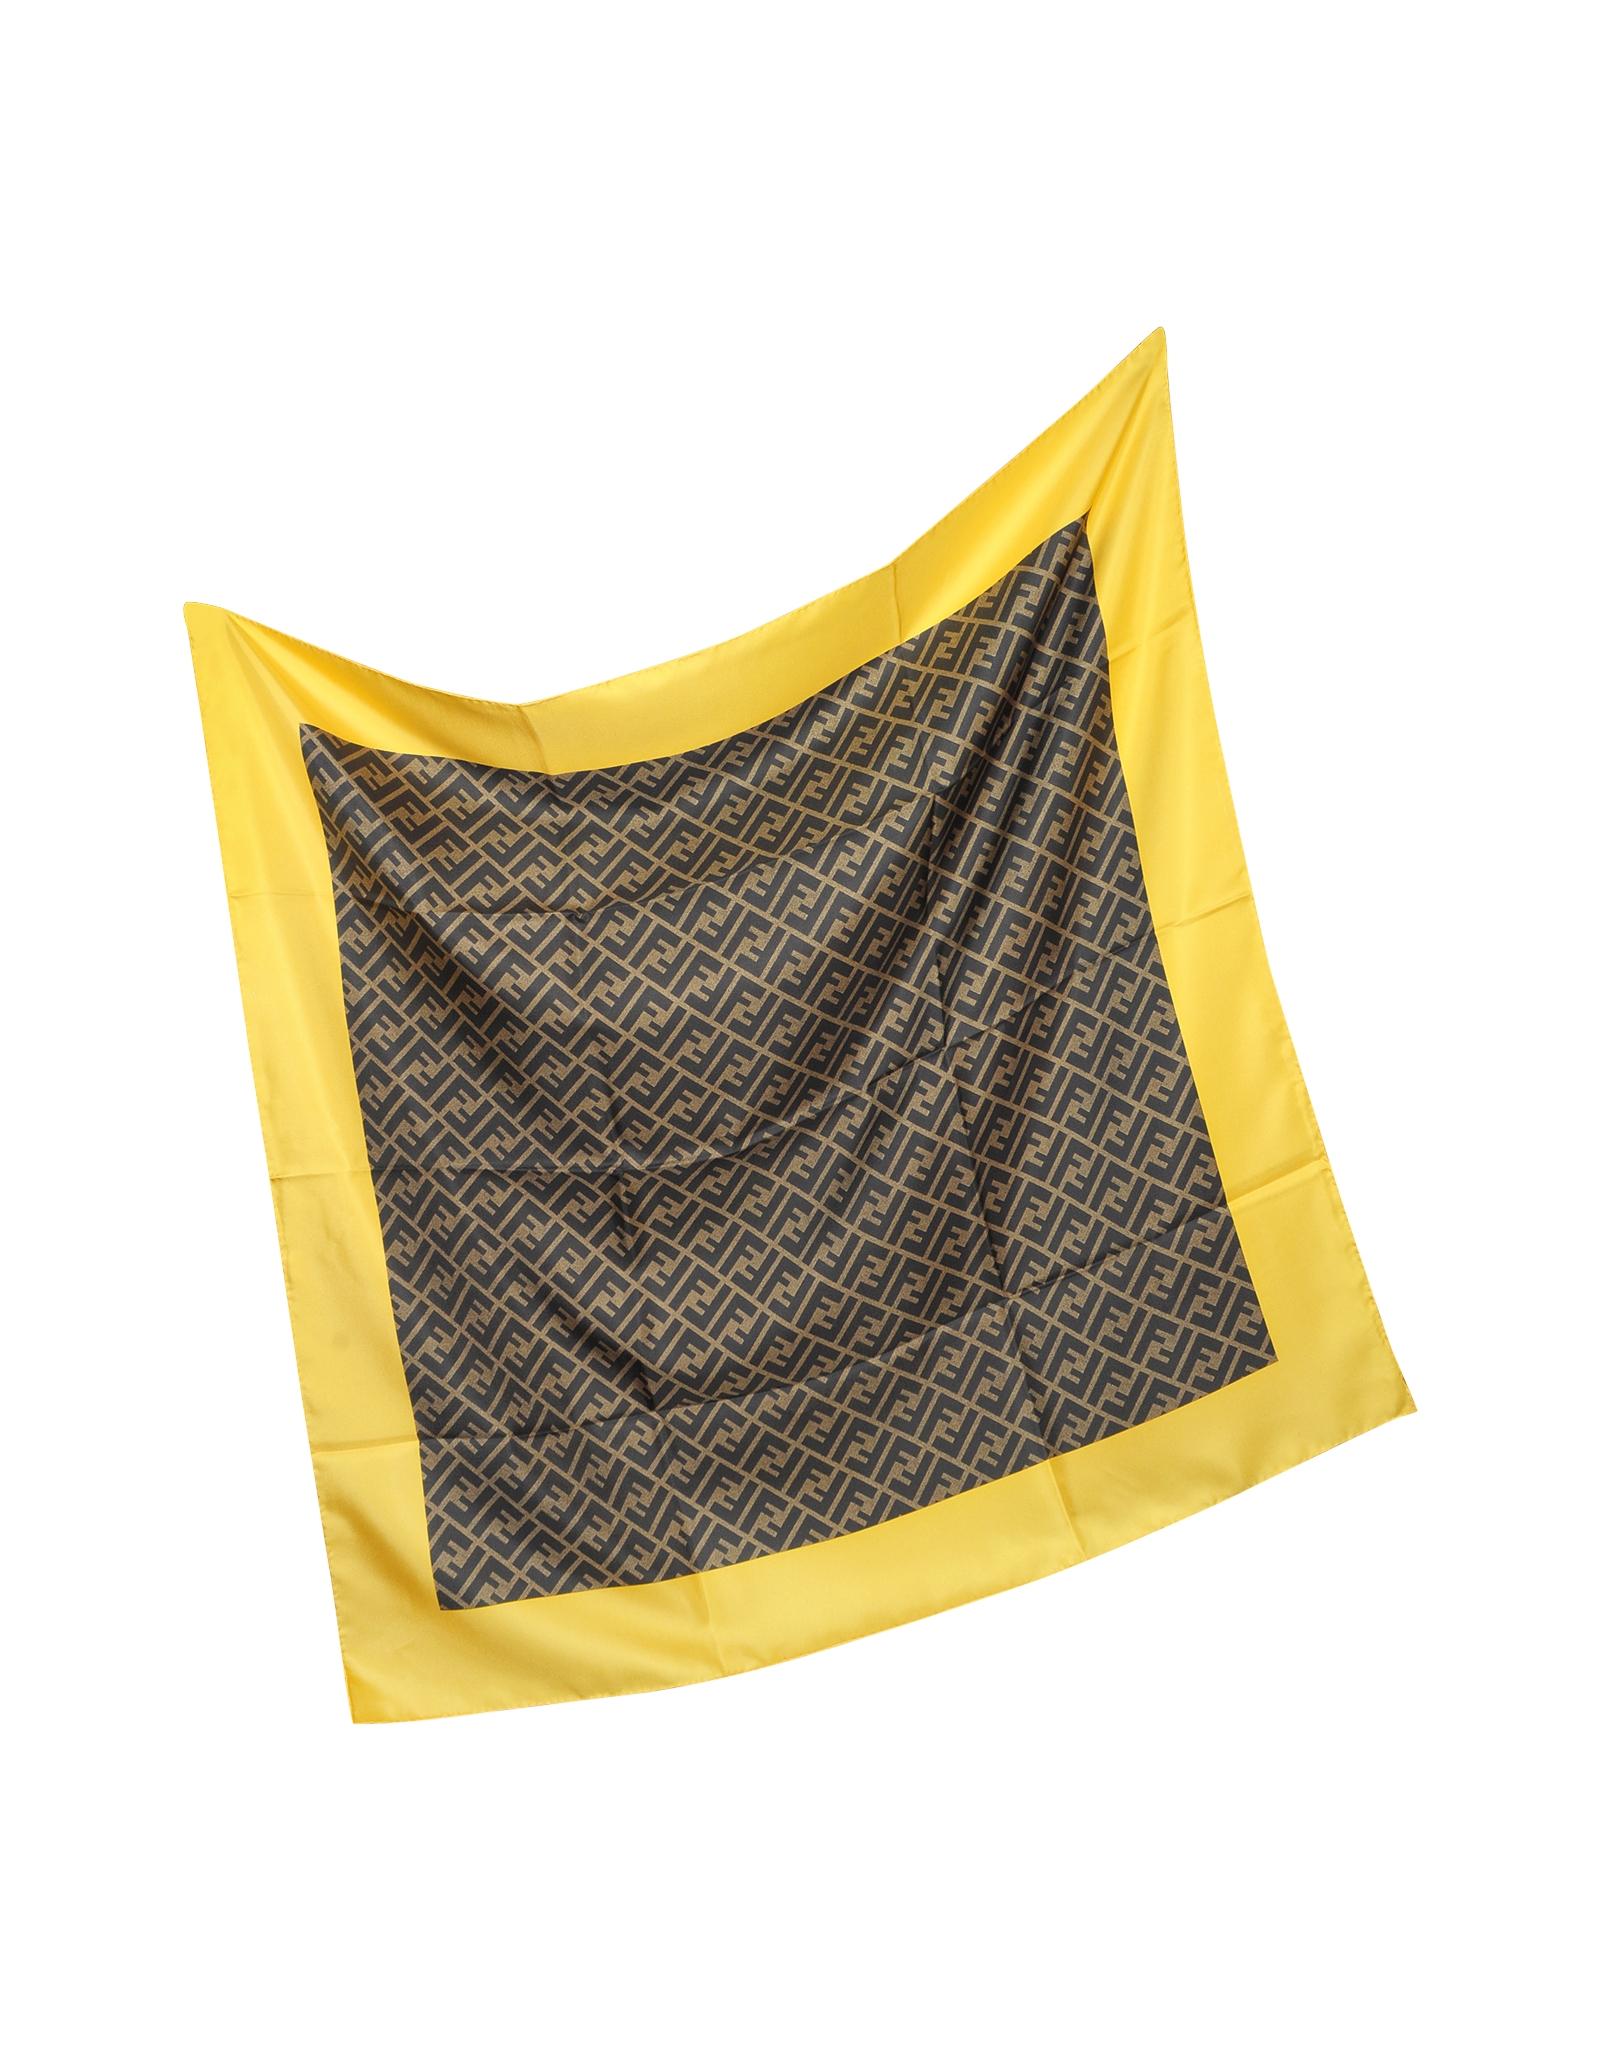 fendi zucca logo twill silk square scarf in yellow ocher